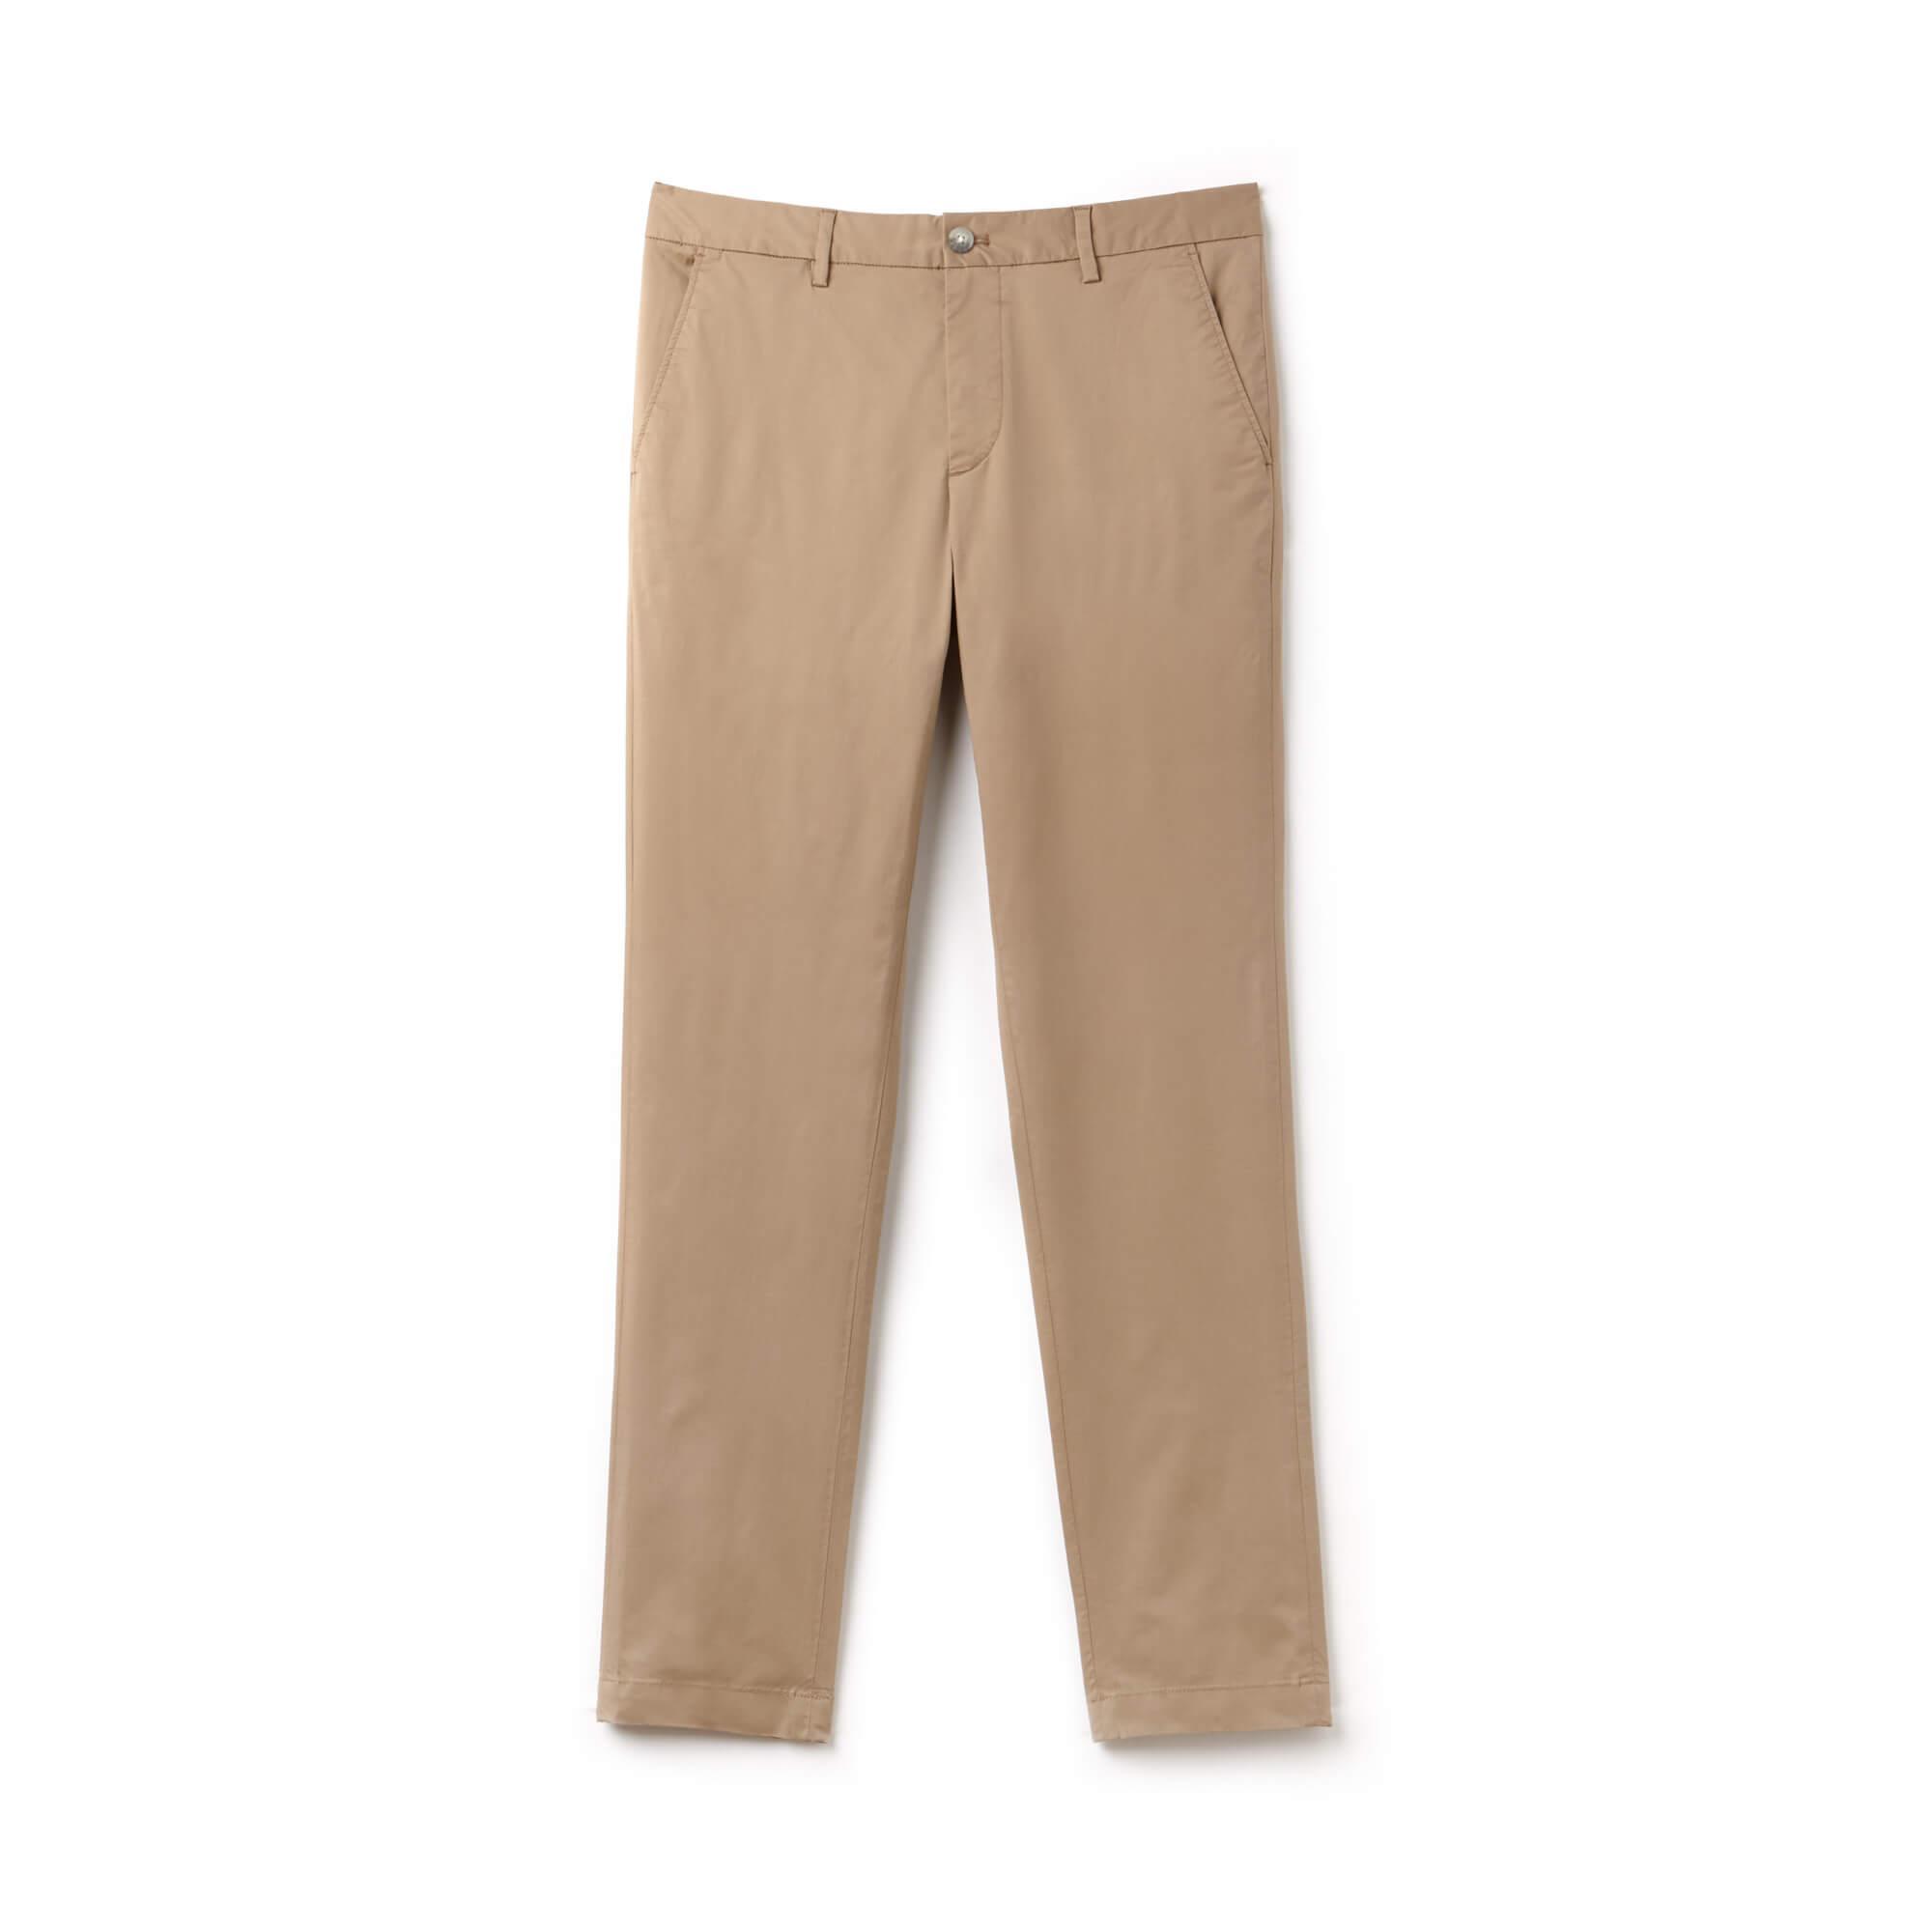 Lacoste Erkek Kahverengi Chino Pantolon